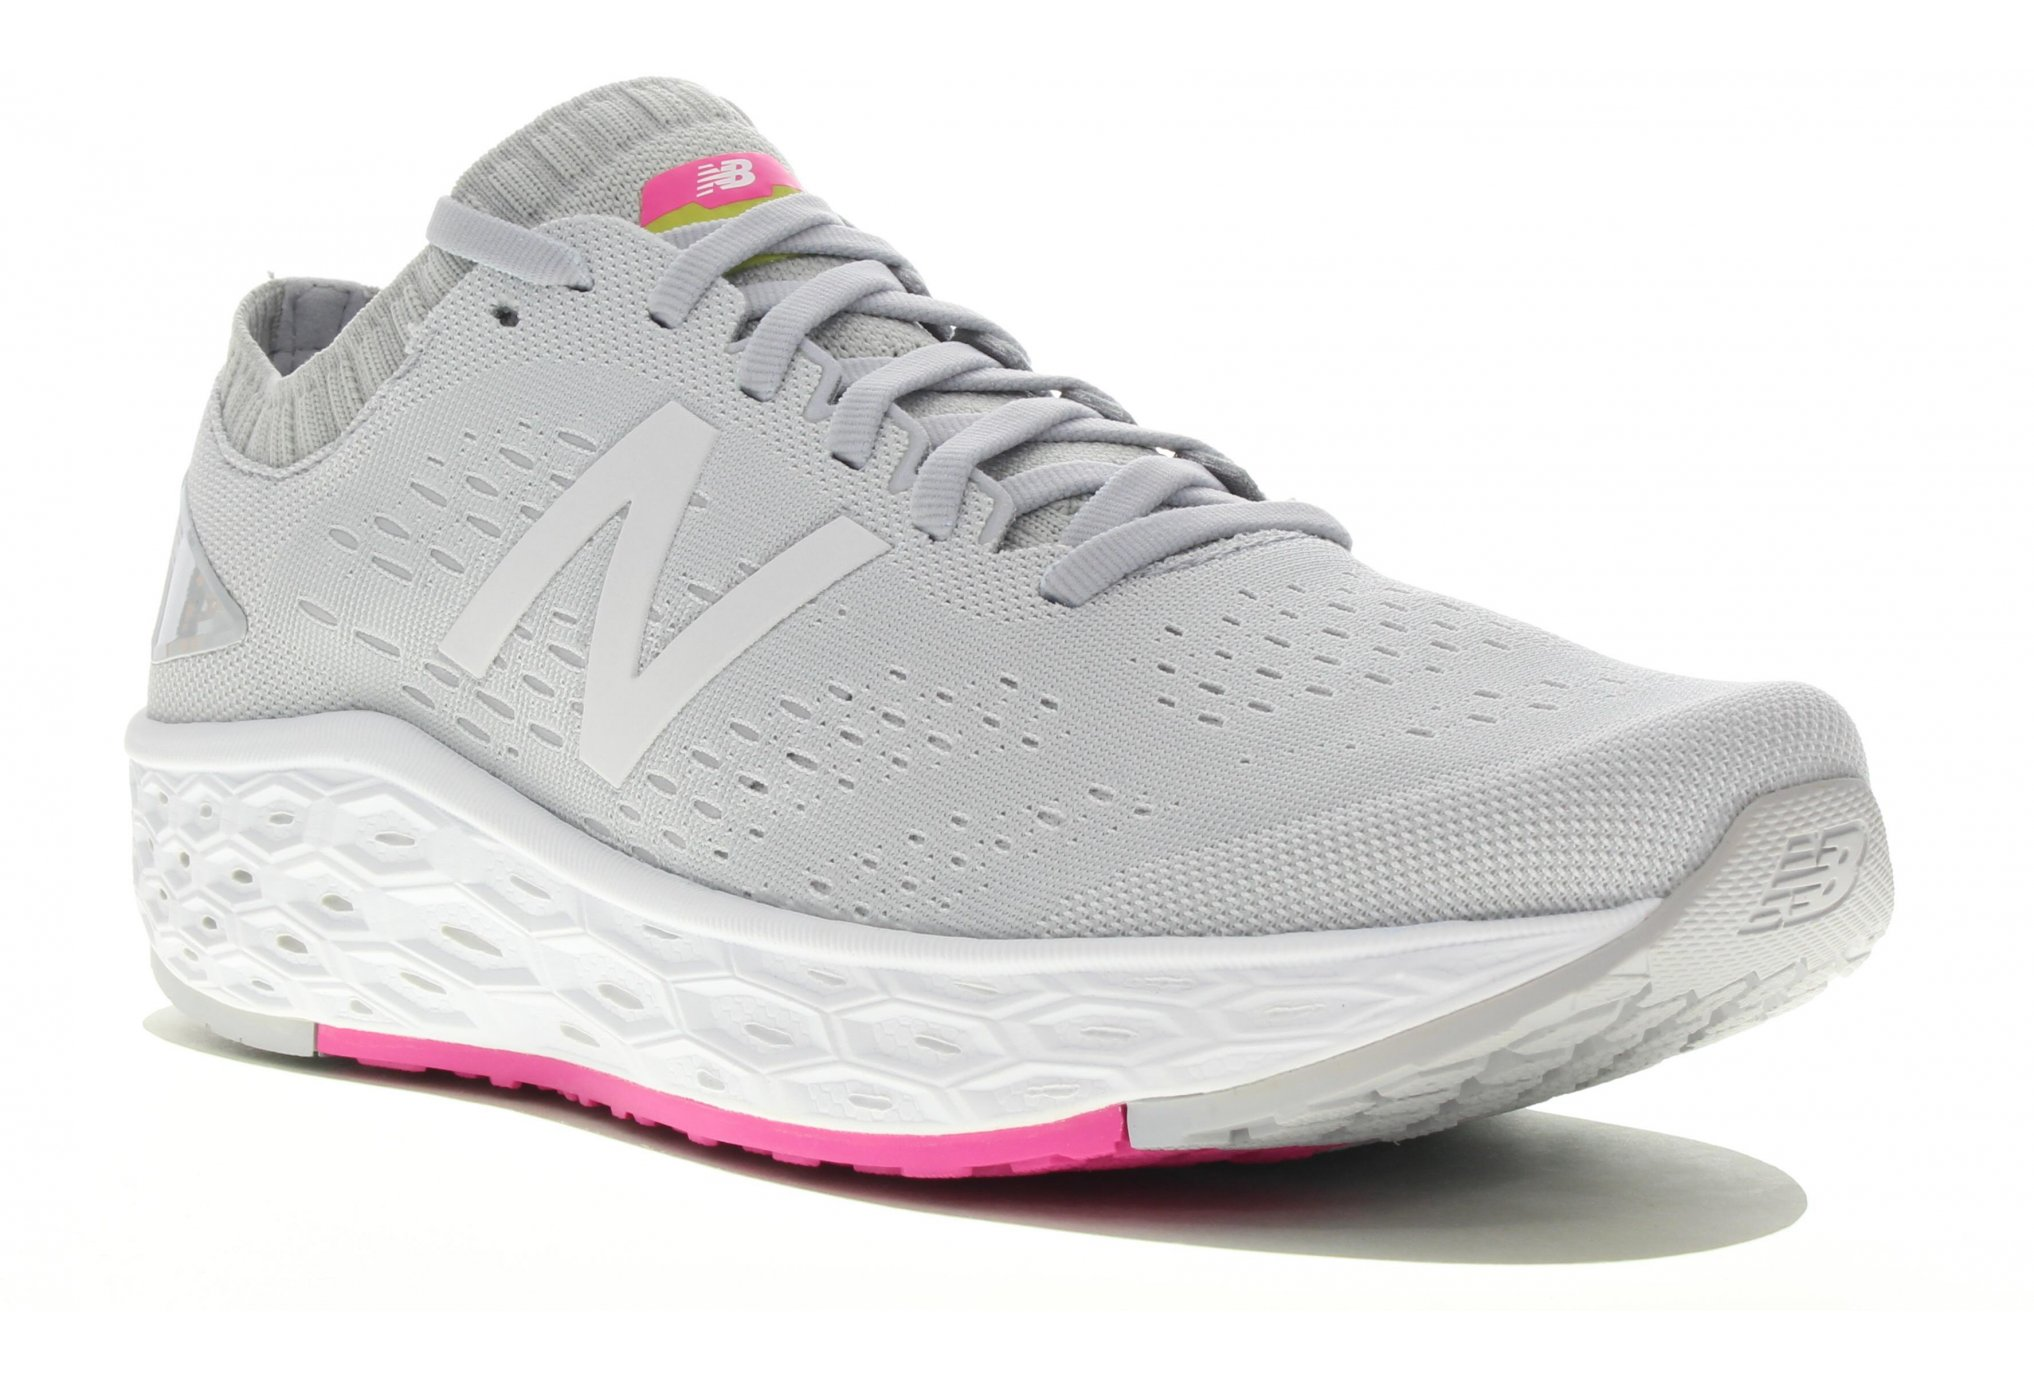 New Balance Fresh Foam Vongo V4 W Diététique Chaussures femme